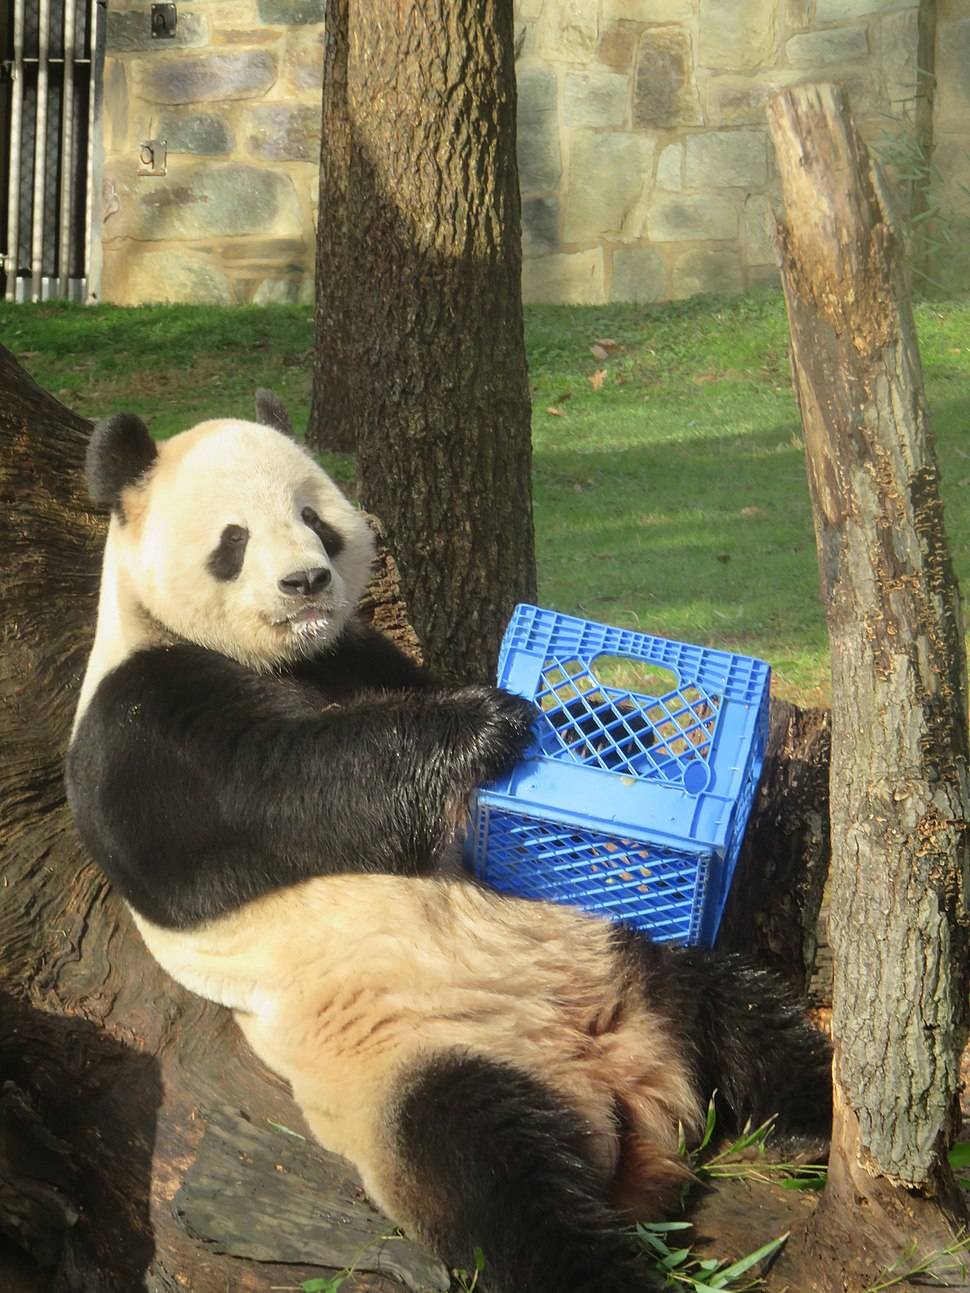 Giant Panda at the zoo